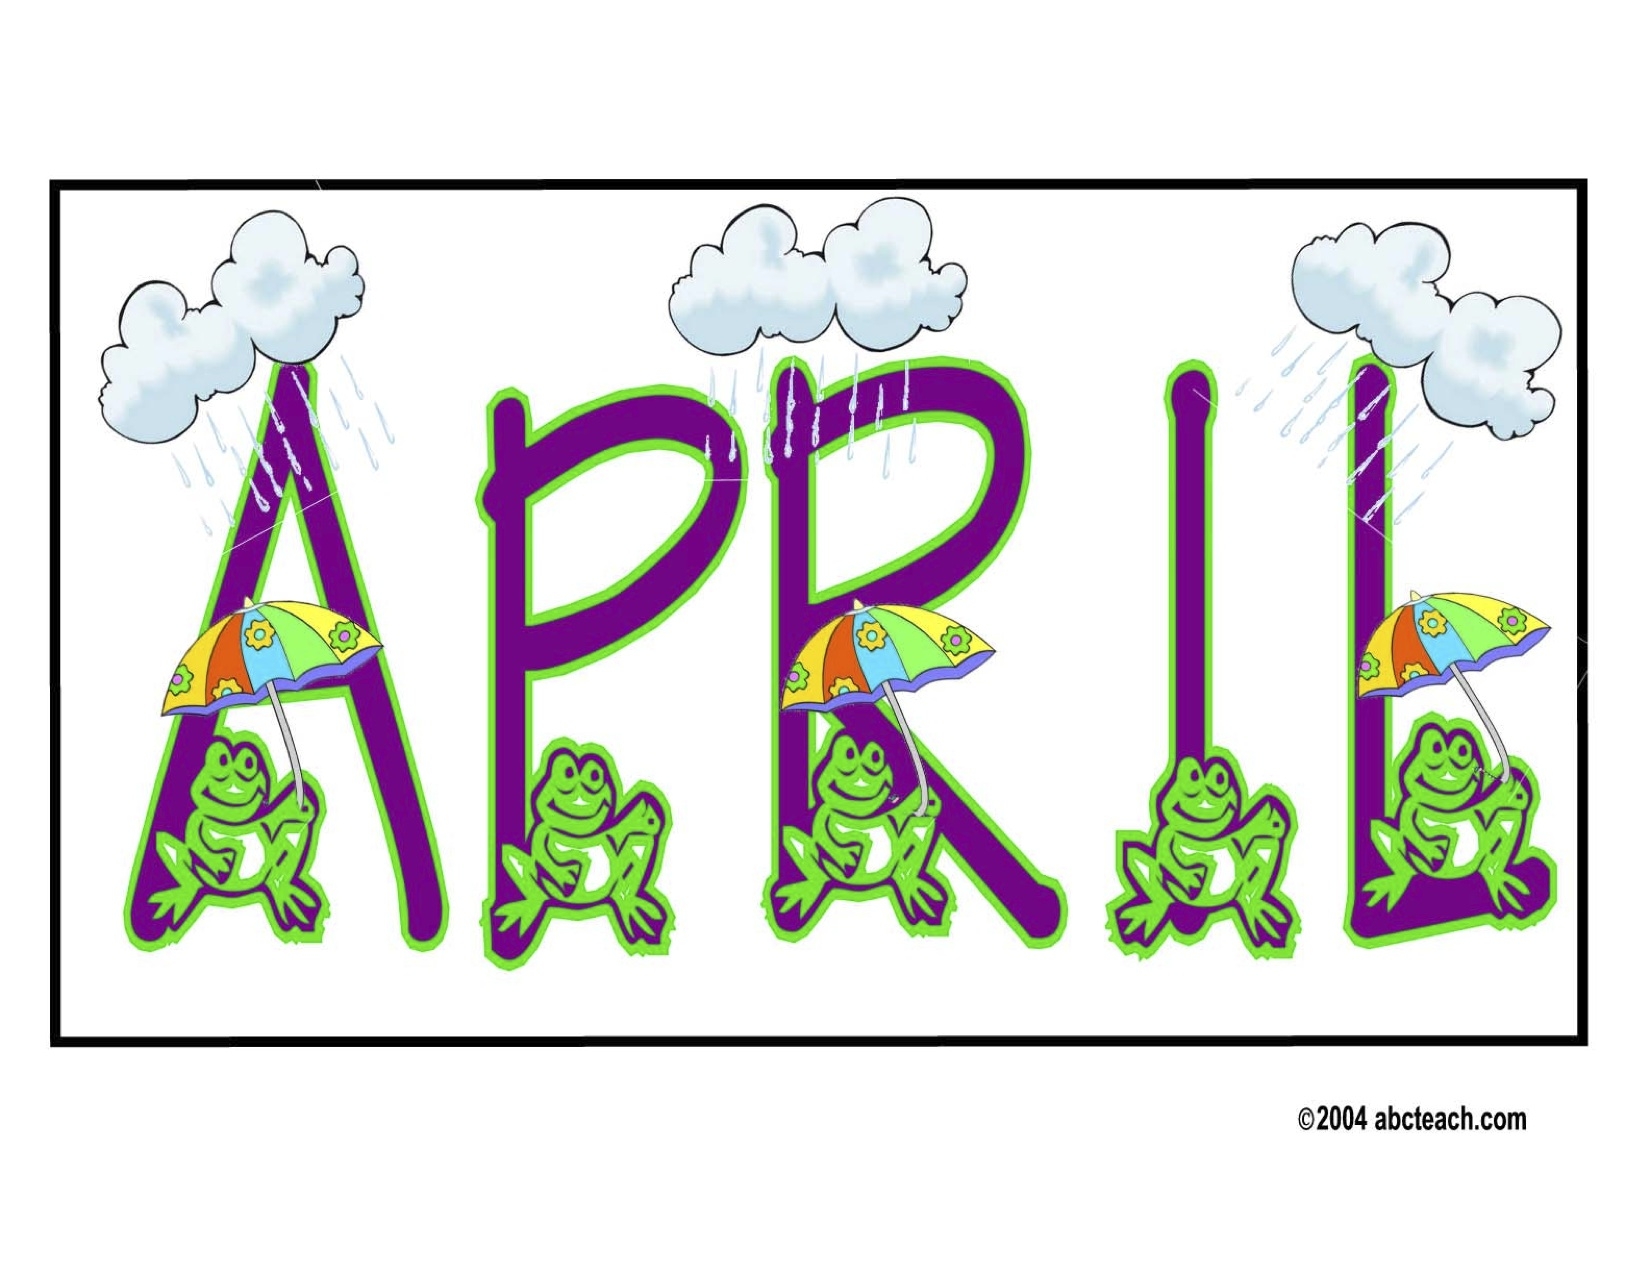 Abcteach Blog Blog Archive April Highlights